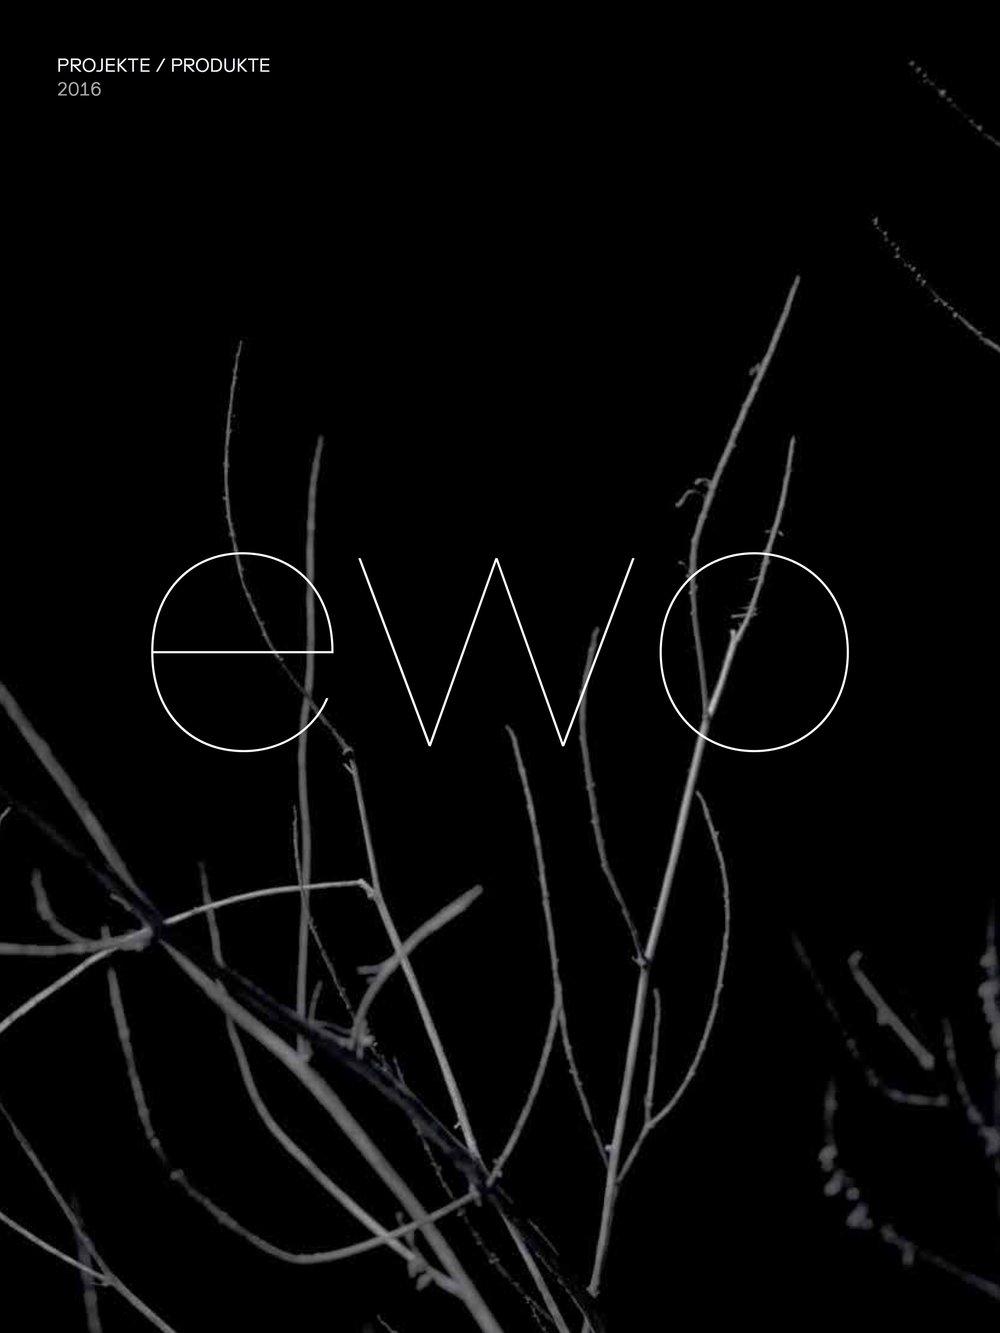 ewo_katalog_2016_DEU.jpg